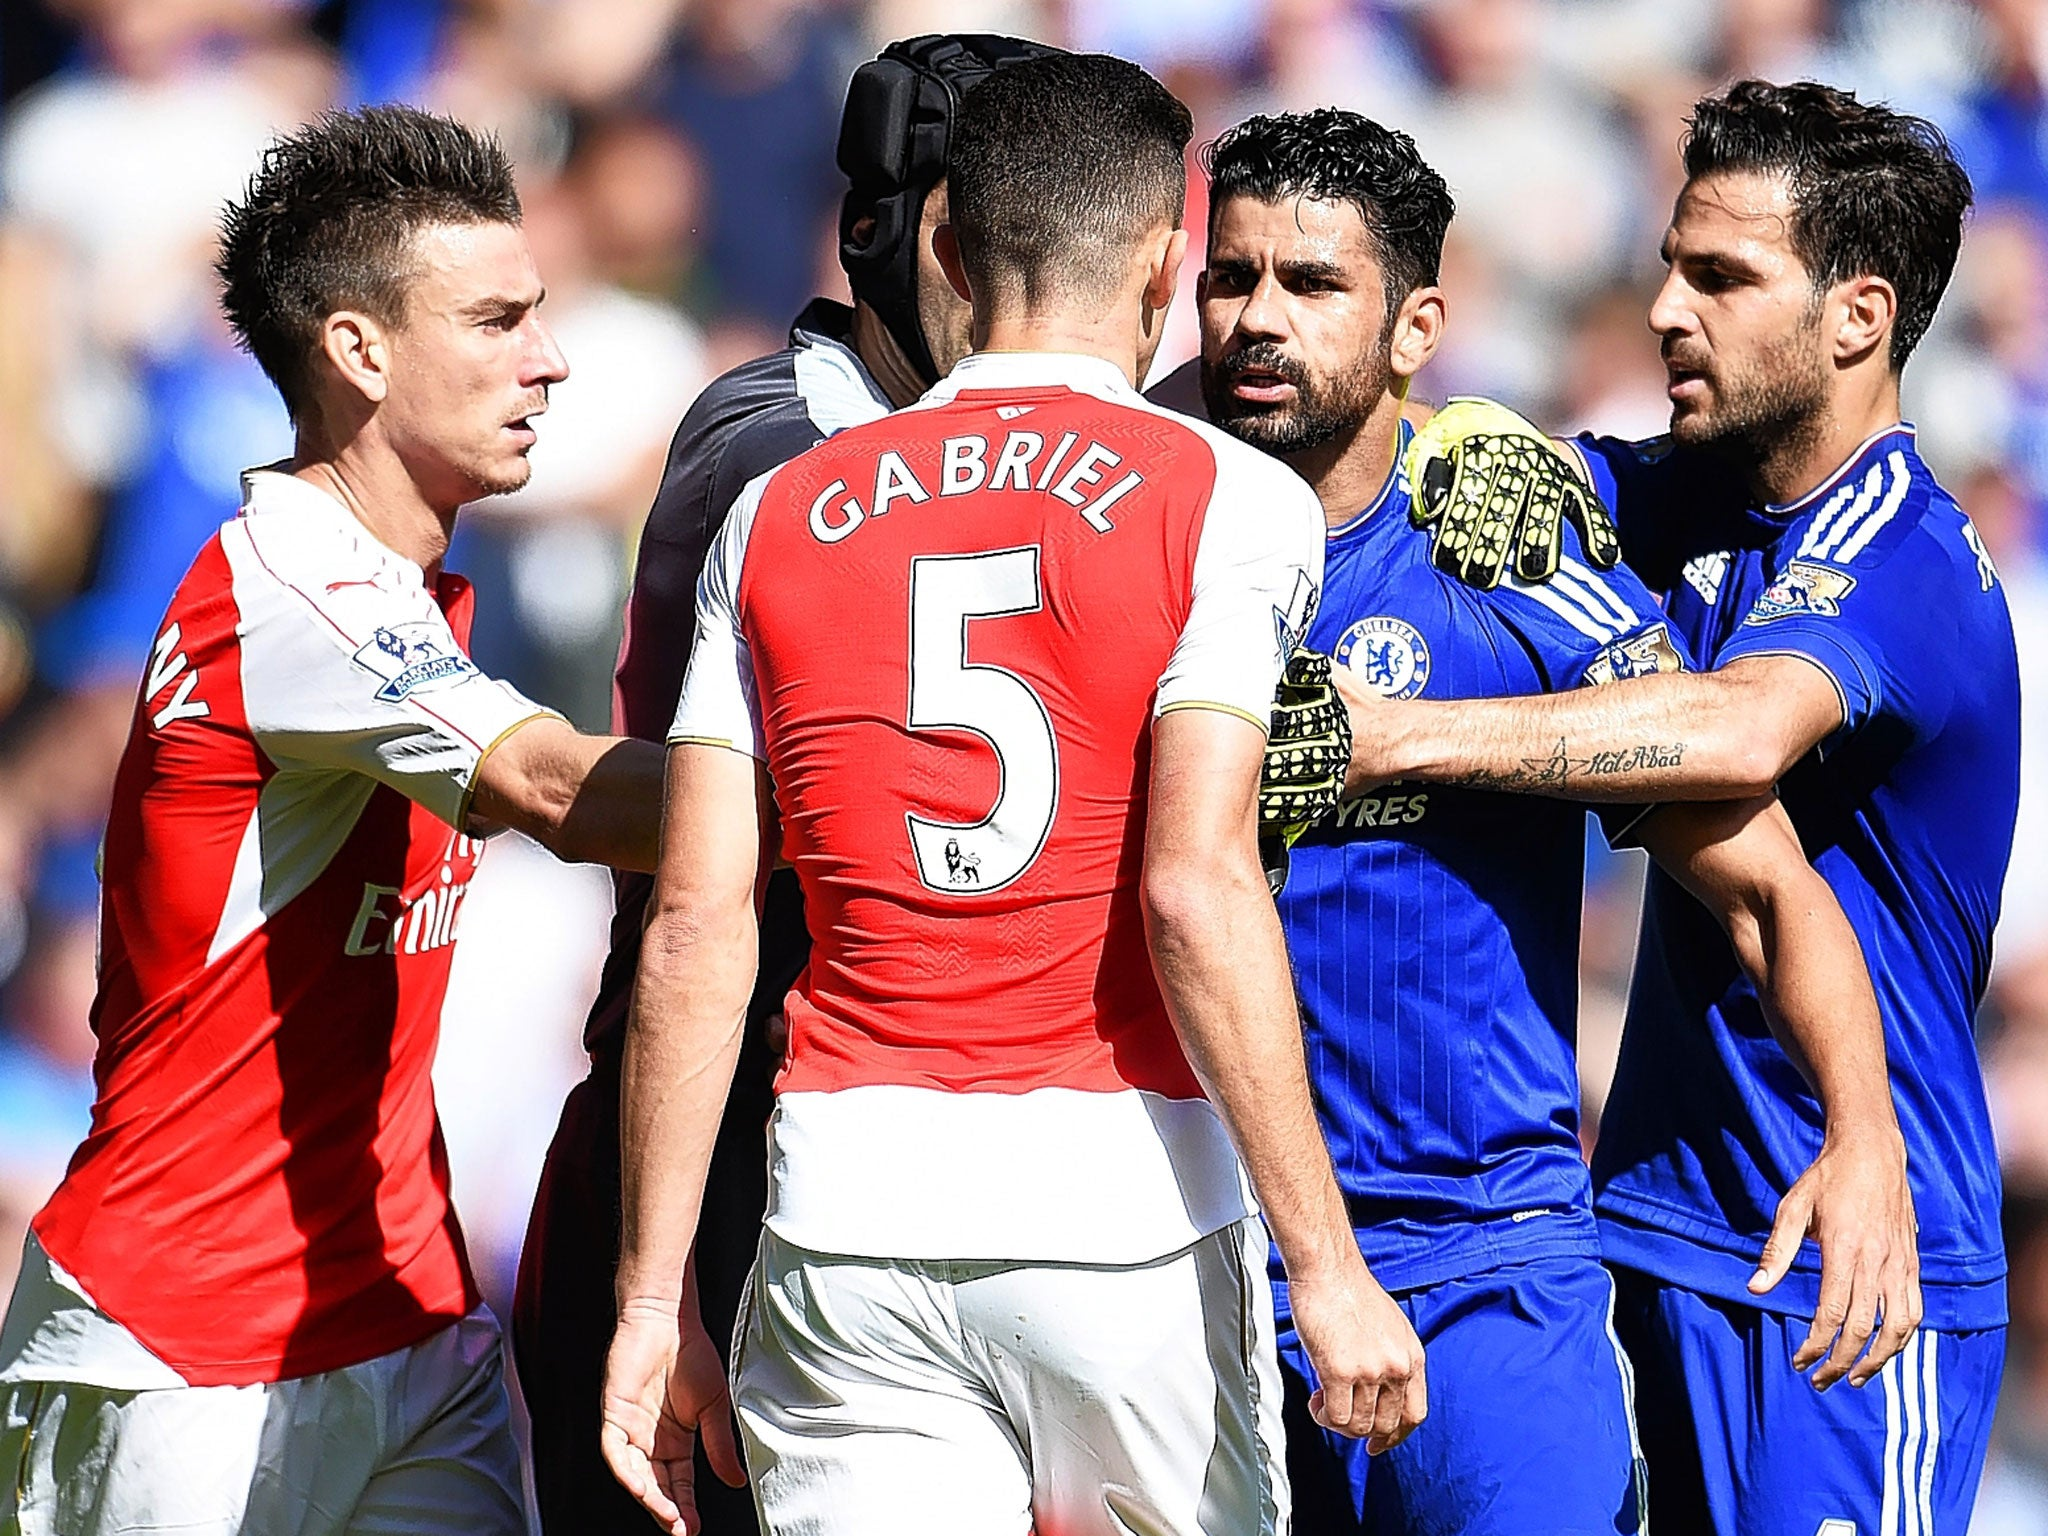 Arsenal vs Chelsea: Guus Hiddink claims he has not seen the Diego Costa-Laurent Koscielny-Gabriel Paulista fight